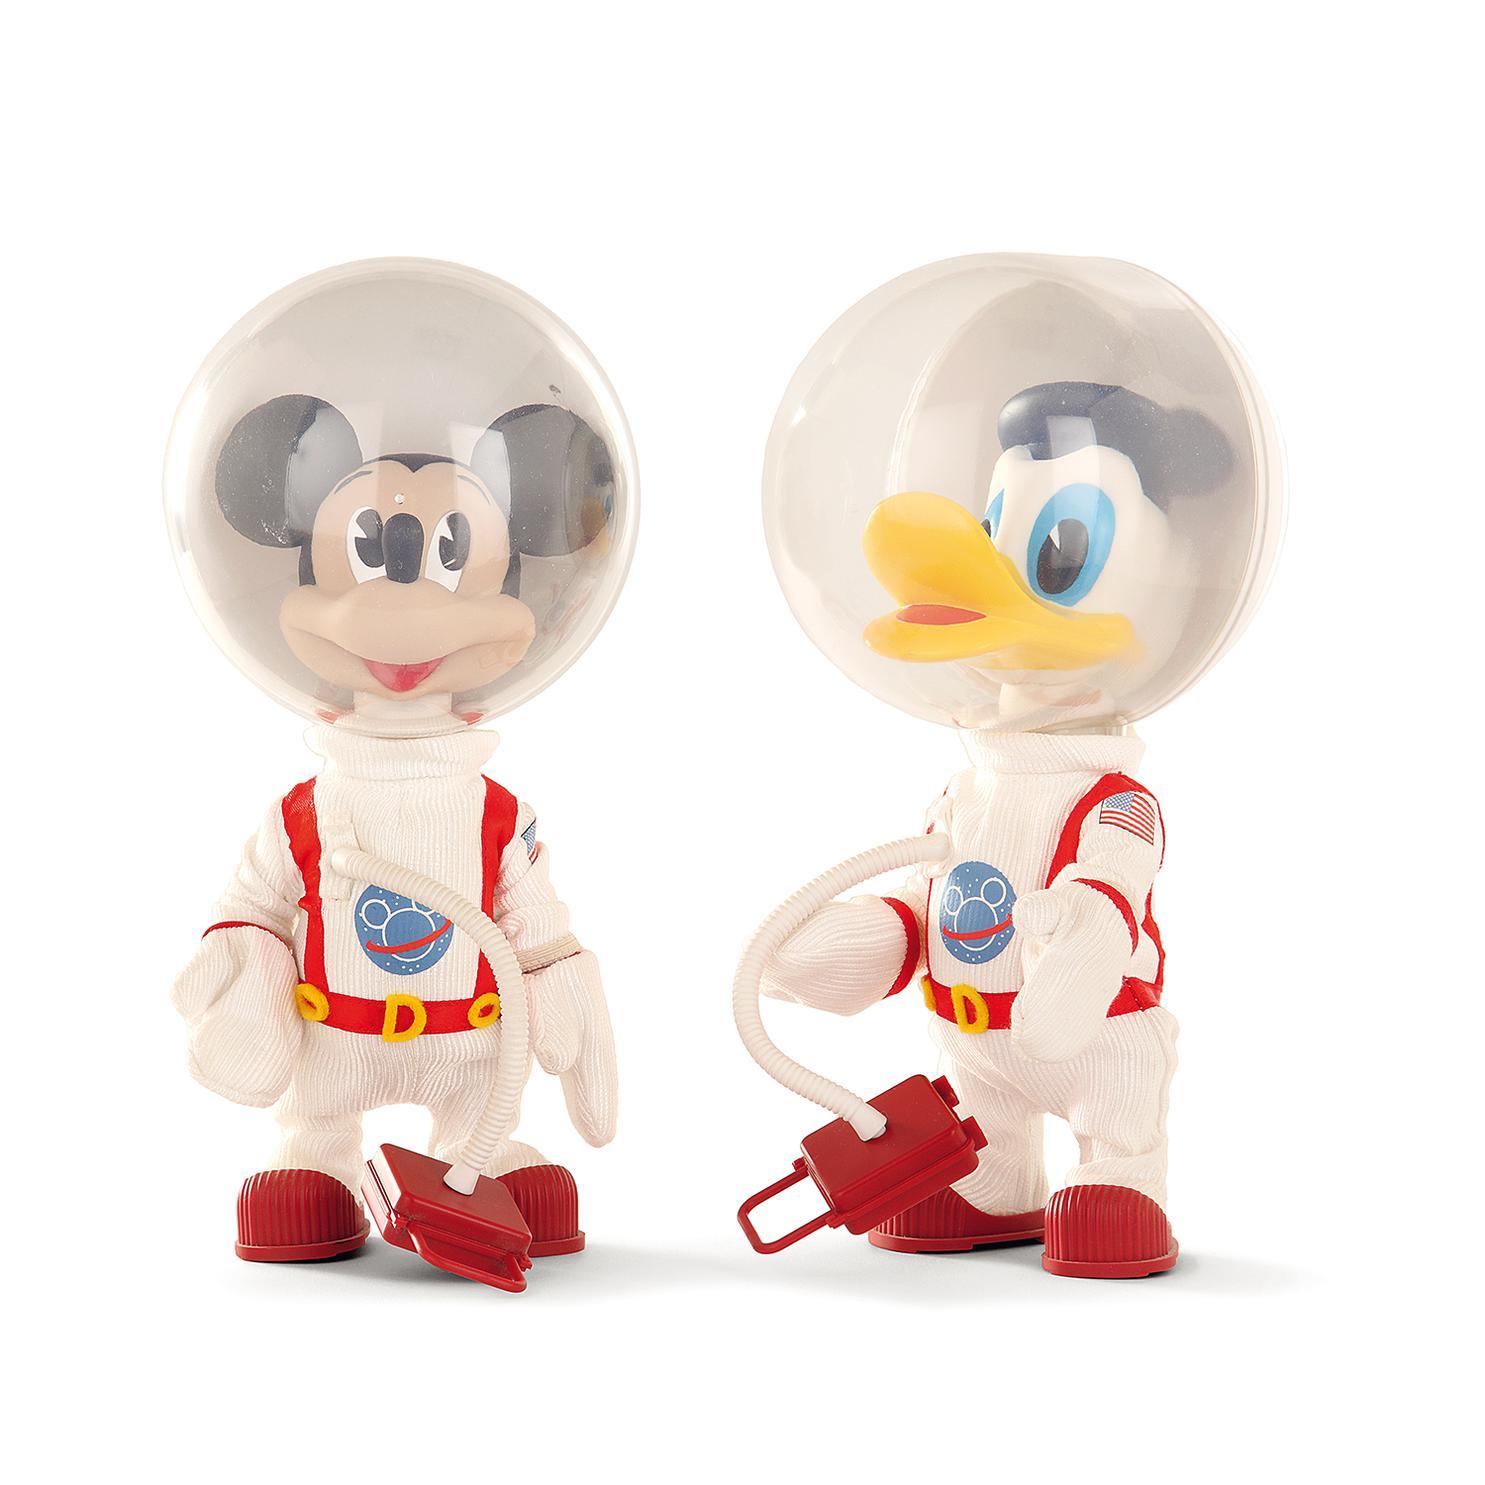 Vinyl Collectible Dolls Disney - Mickey Mouse Et Donald Duckastronautes-